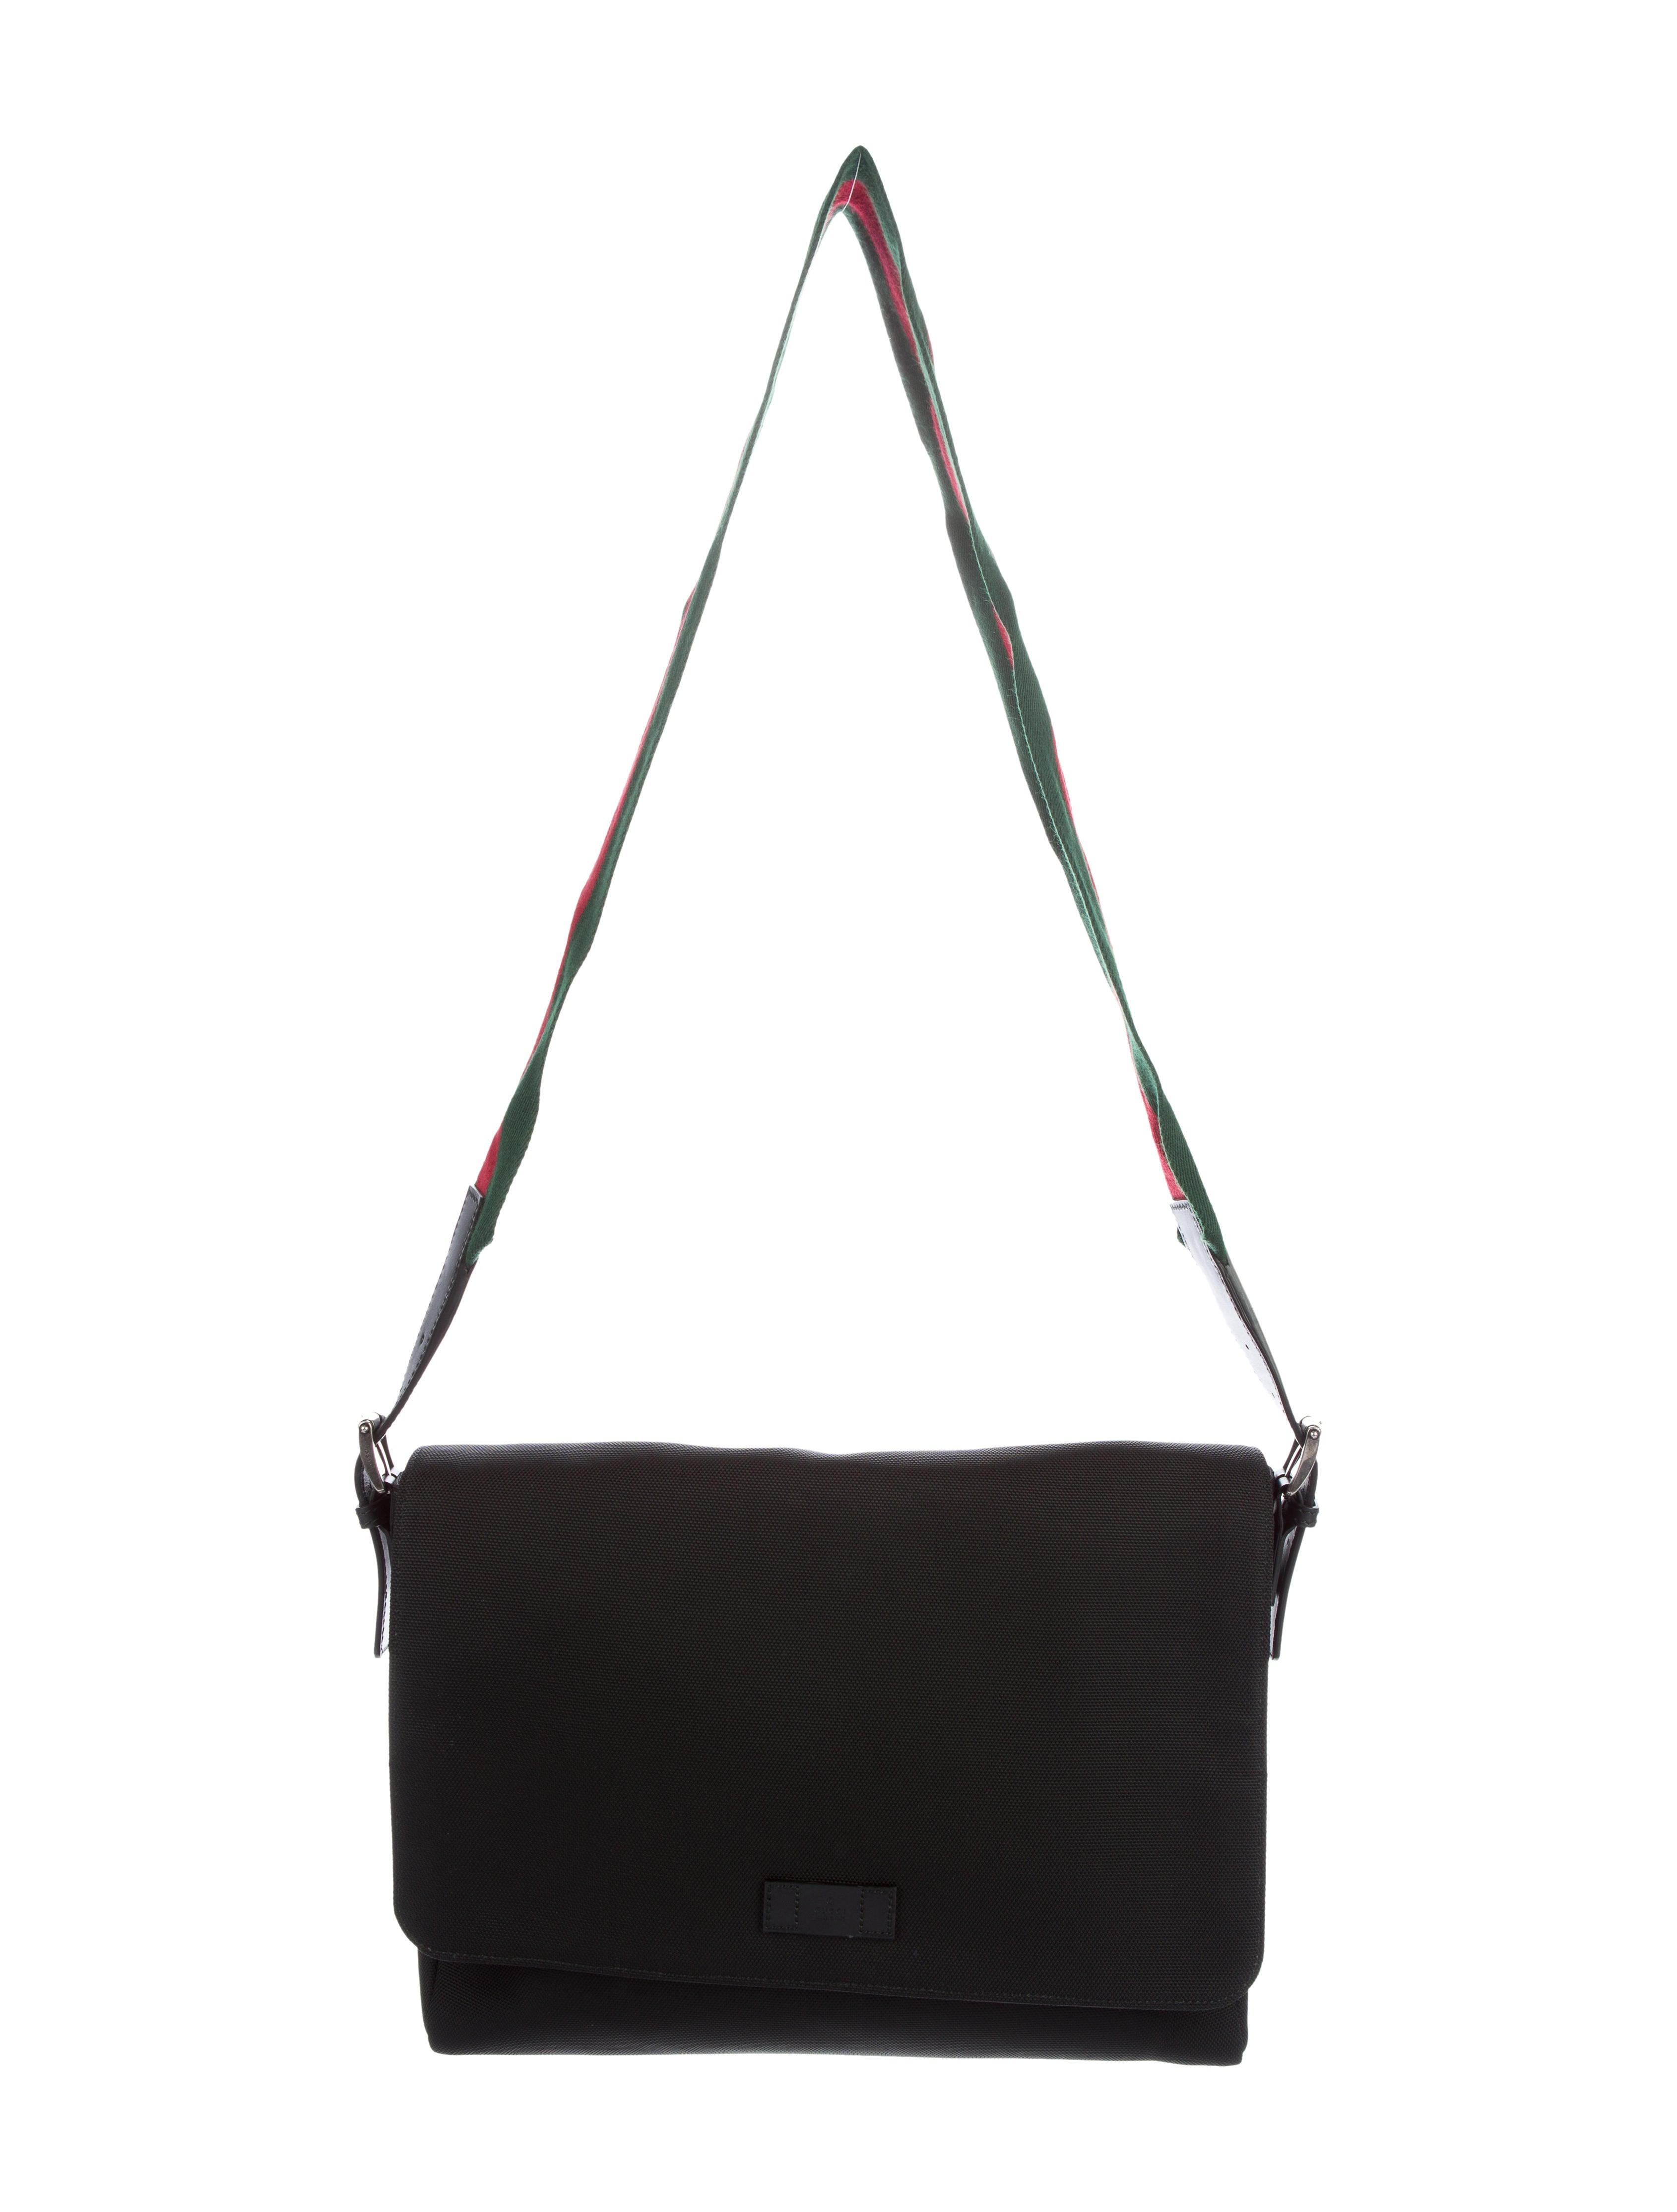 92b2006ecc7 Gucci Techno Canvas Messenger Bag - Bags - GUC127256